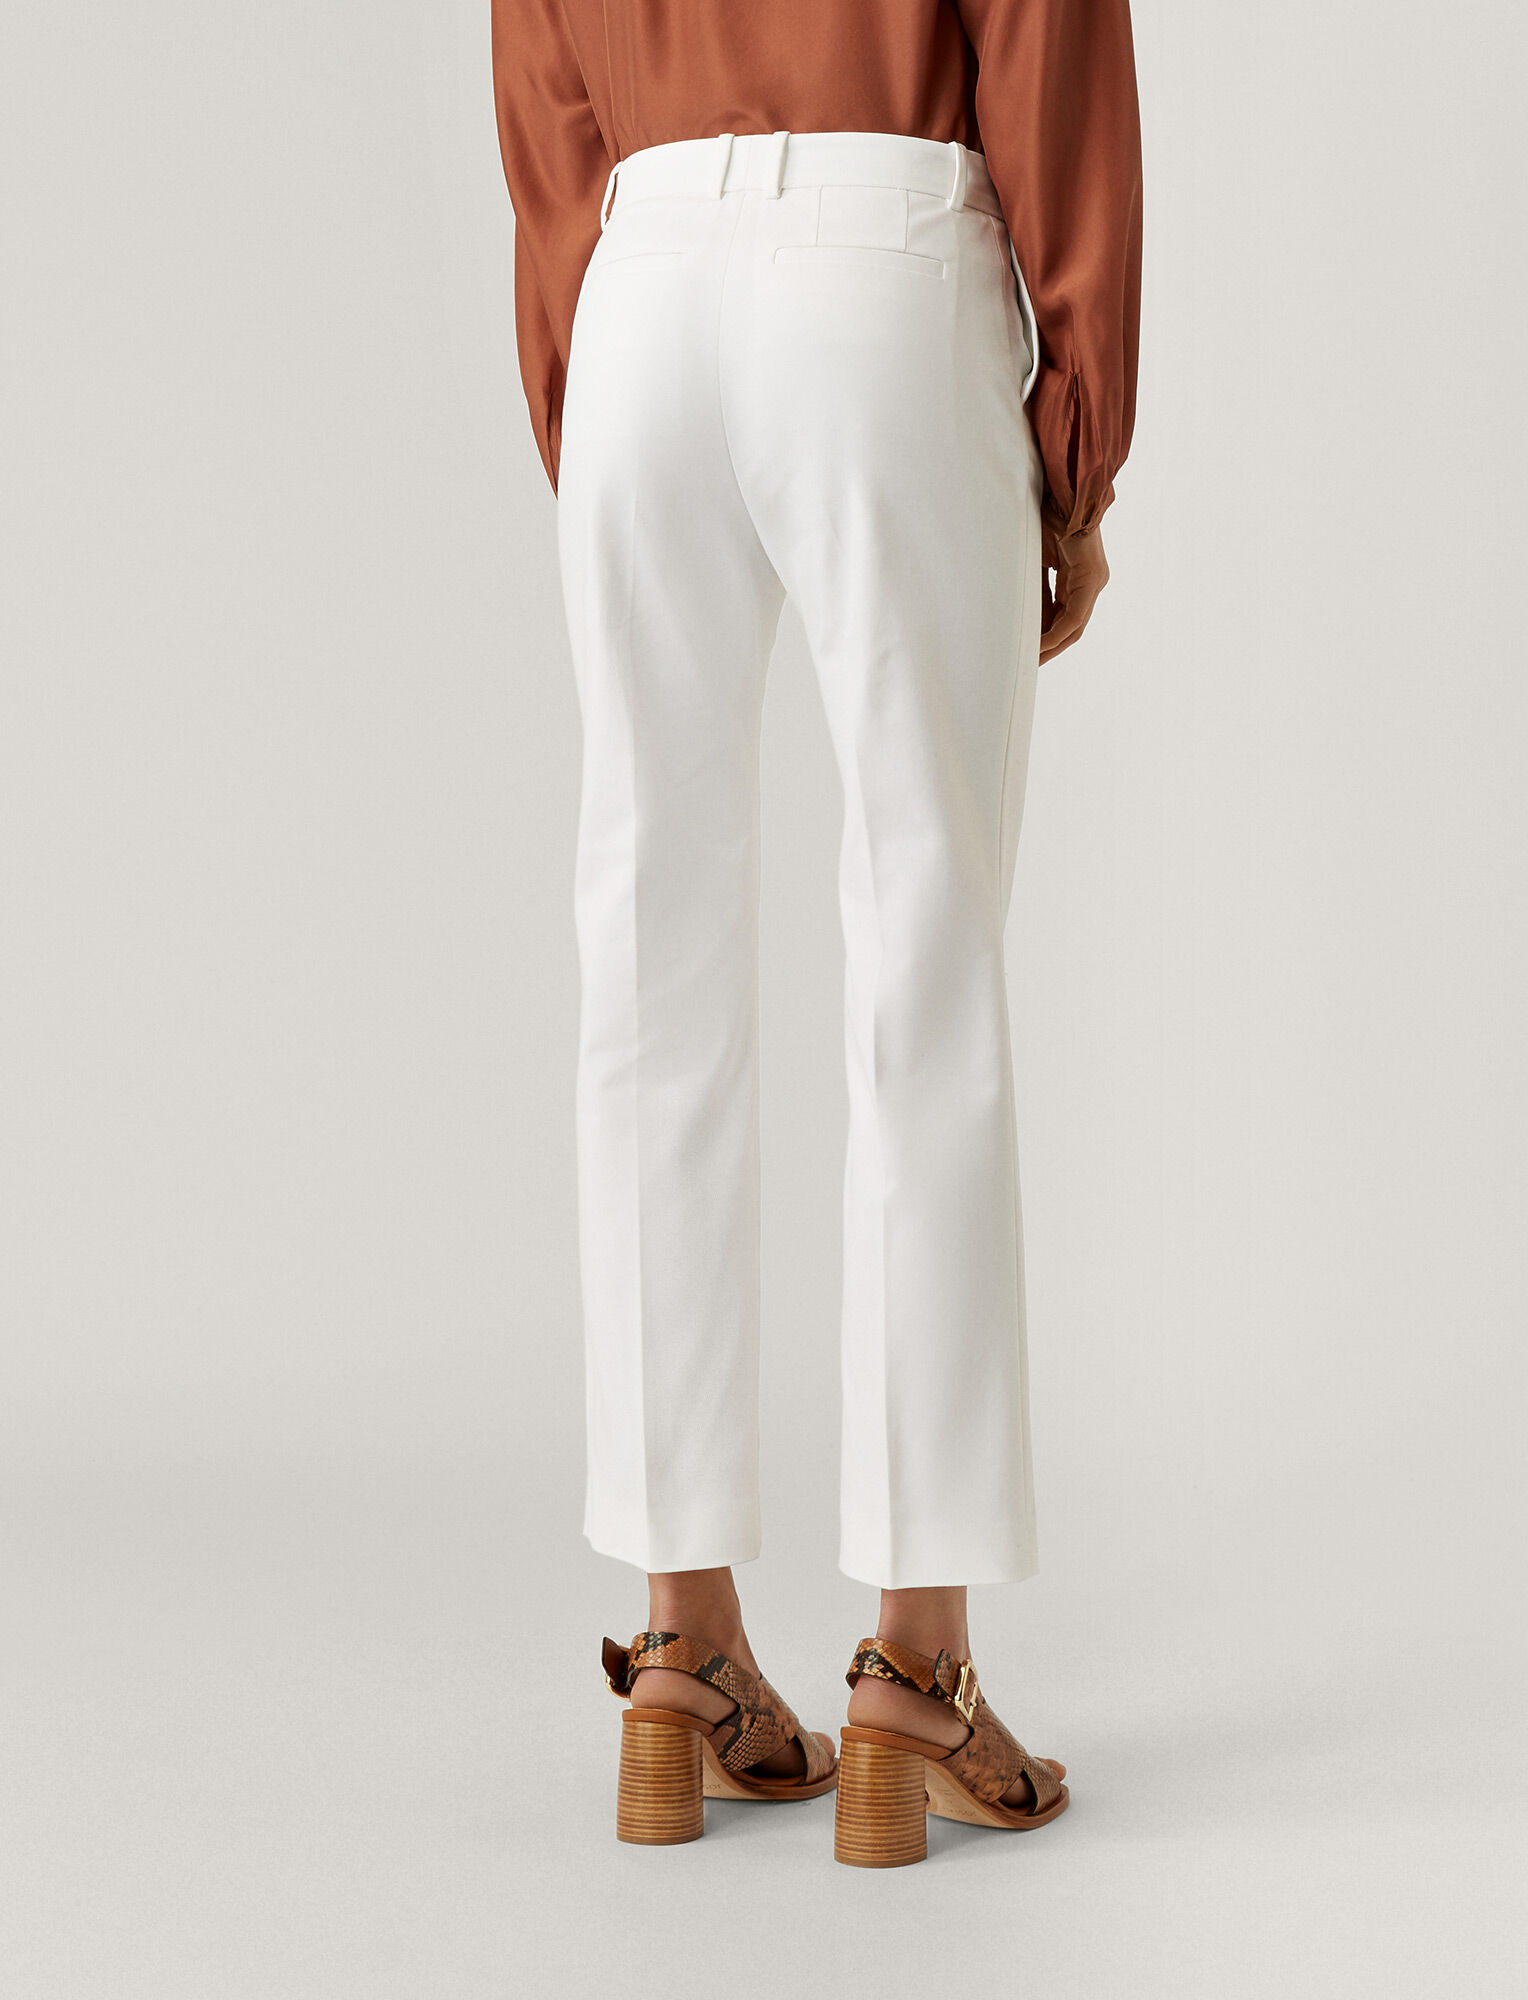 Joseph, Pantalon Coleman en double coton stretch, in WHITE